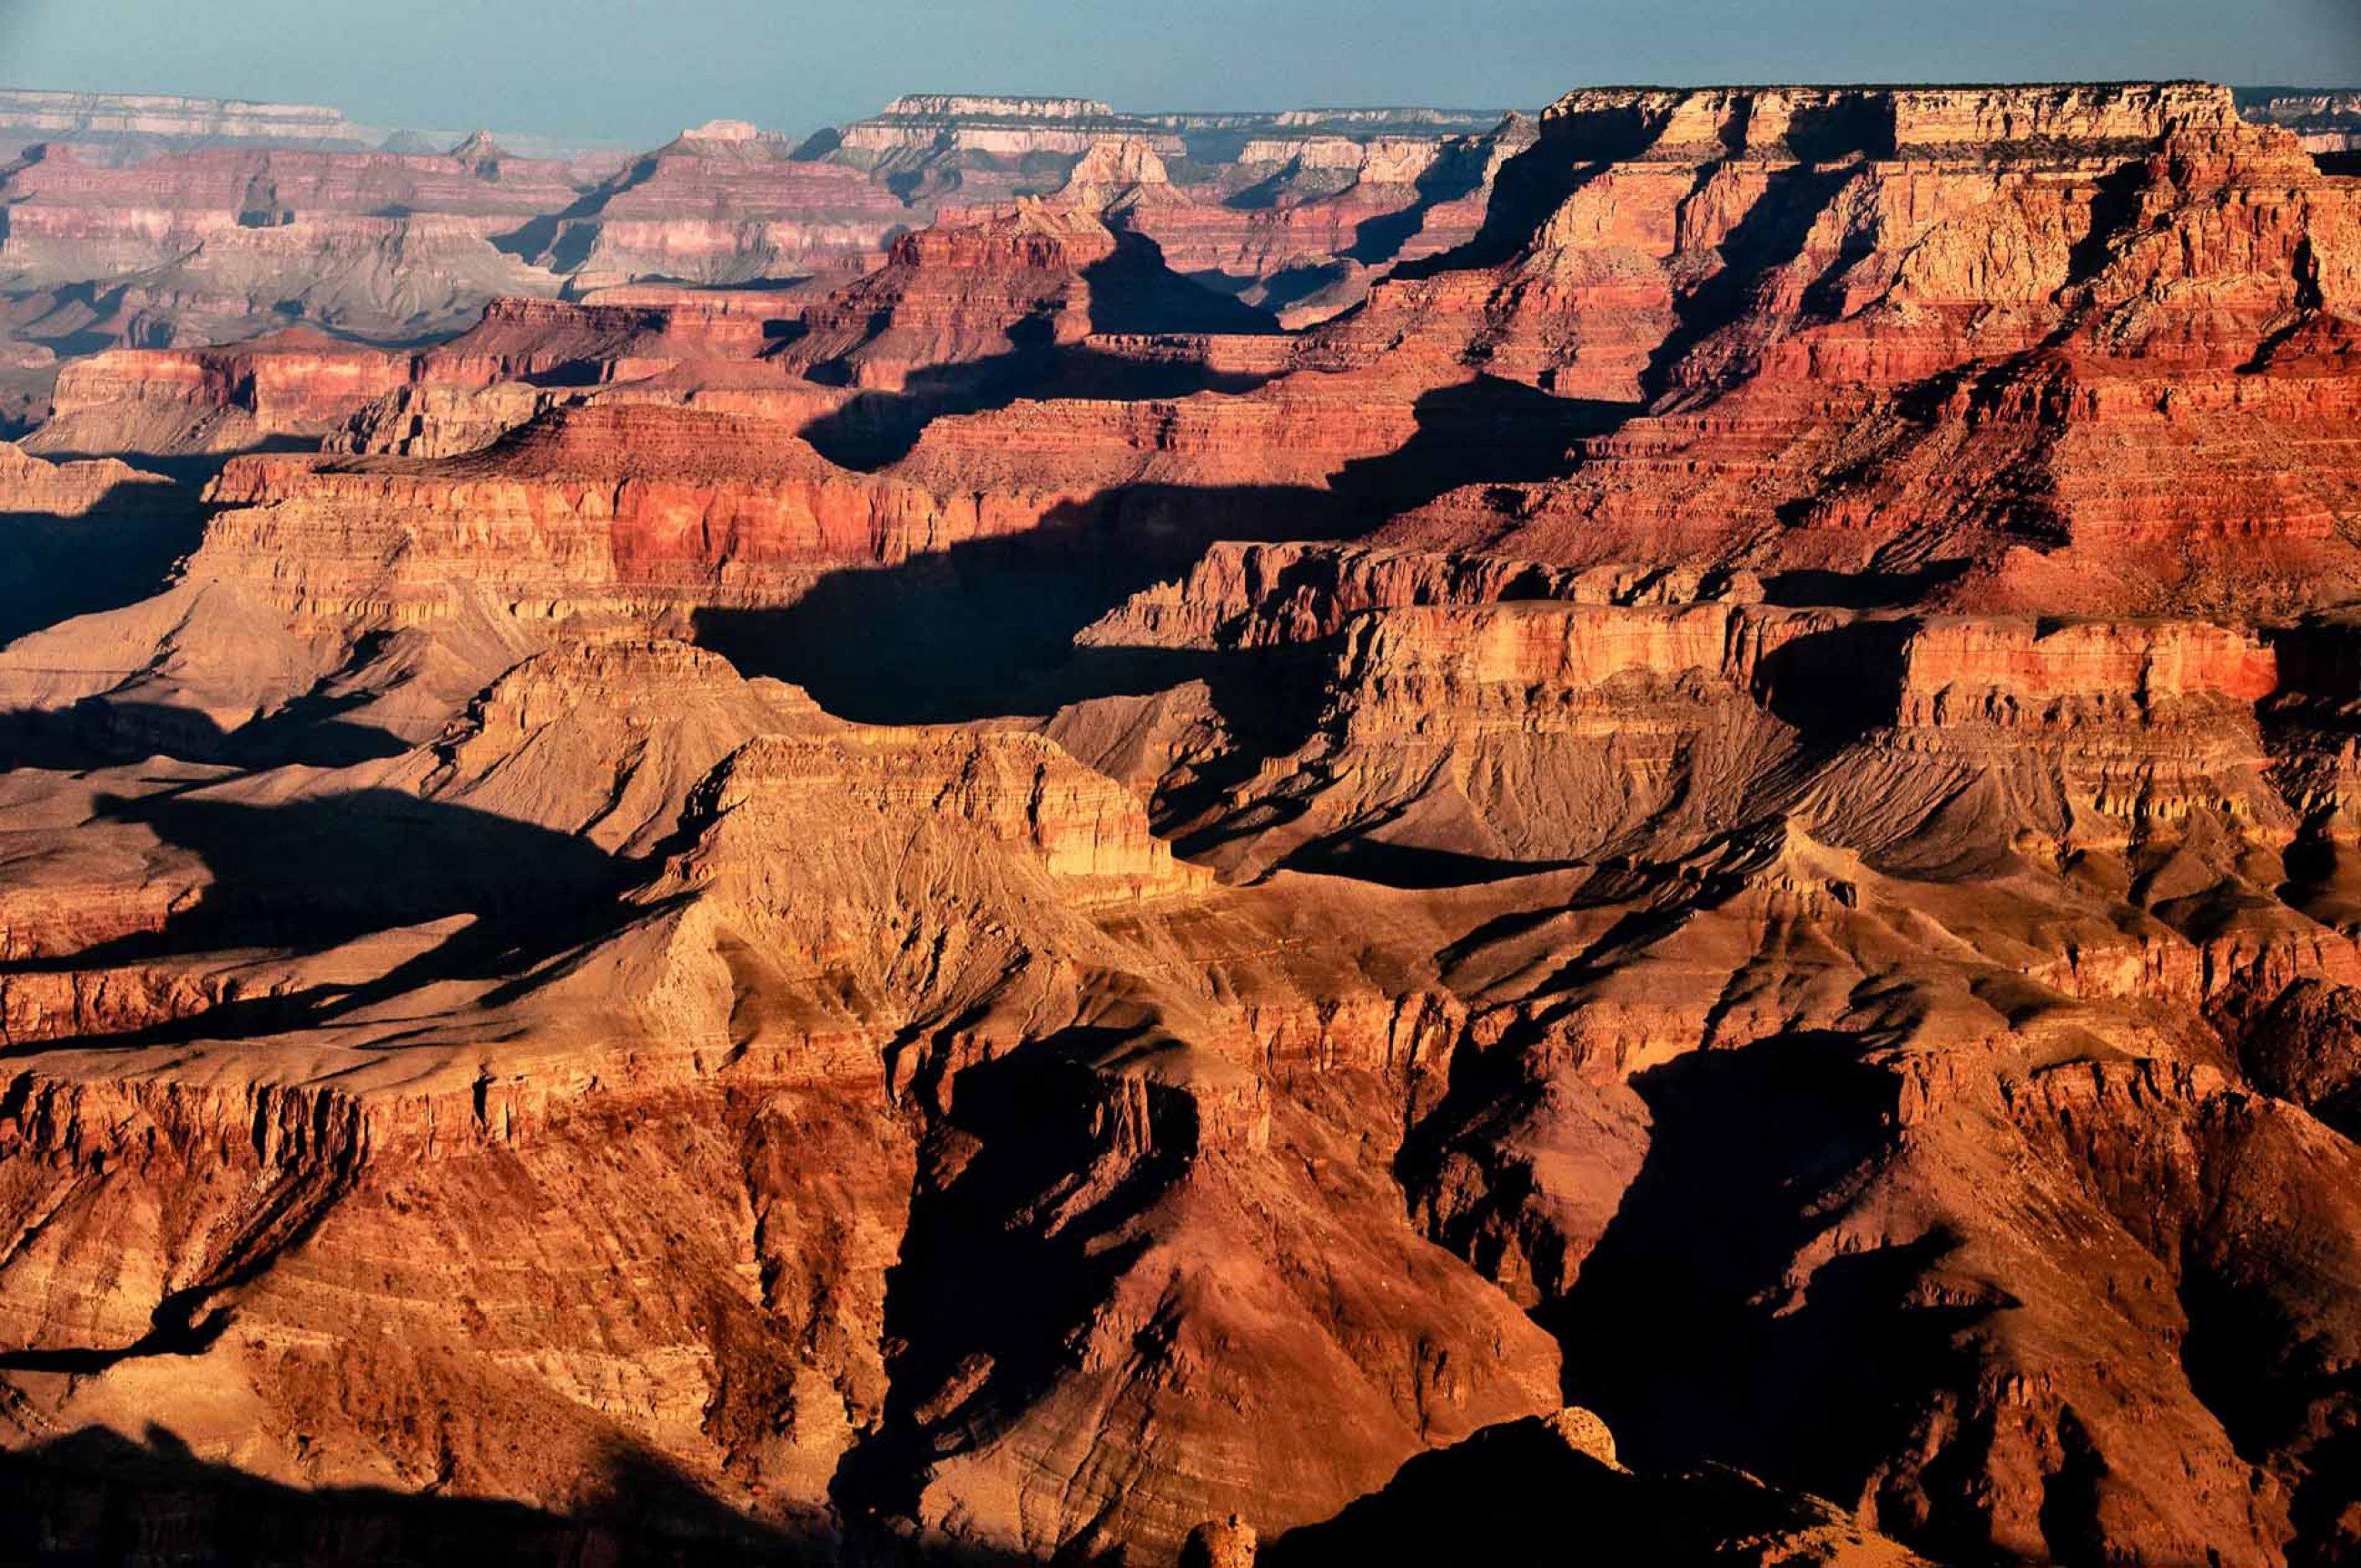 https://bubo.sk/uploads/galleries/7324/grand-canyon-shutterstock-236202247-5-.jpg